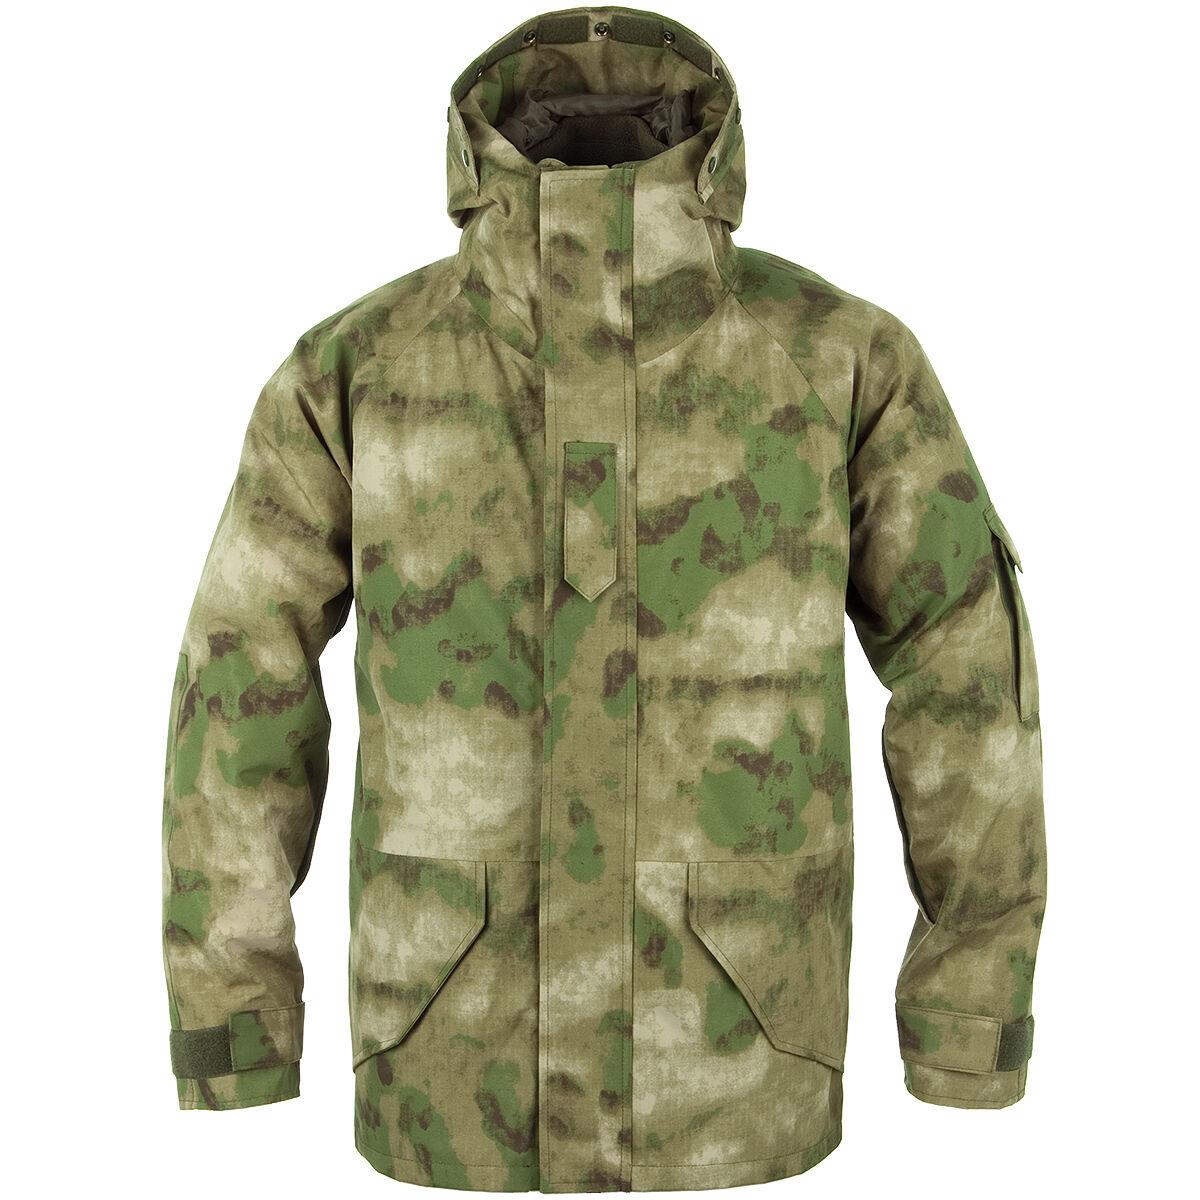 US ECWCS Cold Wet Wet Wet Weather Umidità Prossoezione Parka Army Pile Giacca MIL TACS FG XLarge dfada8